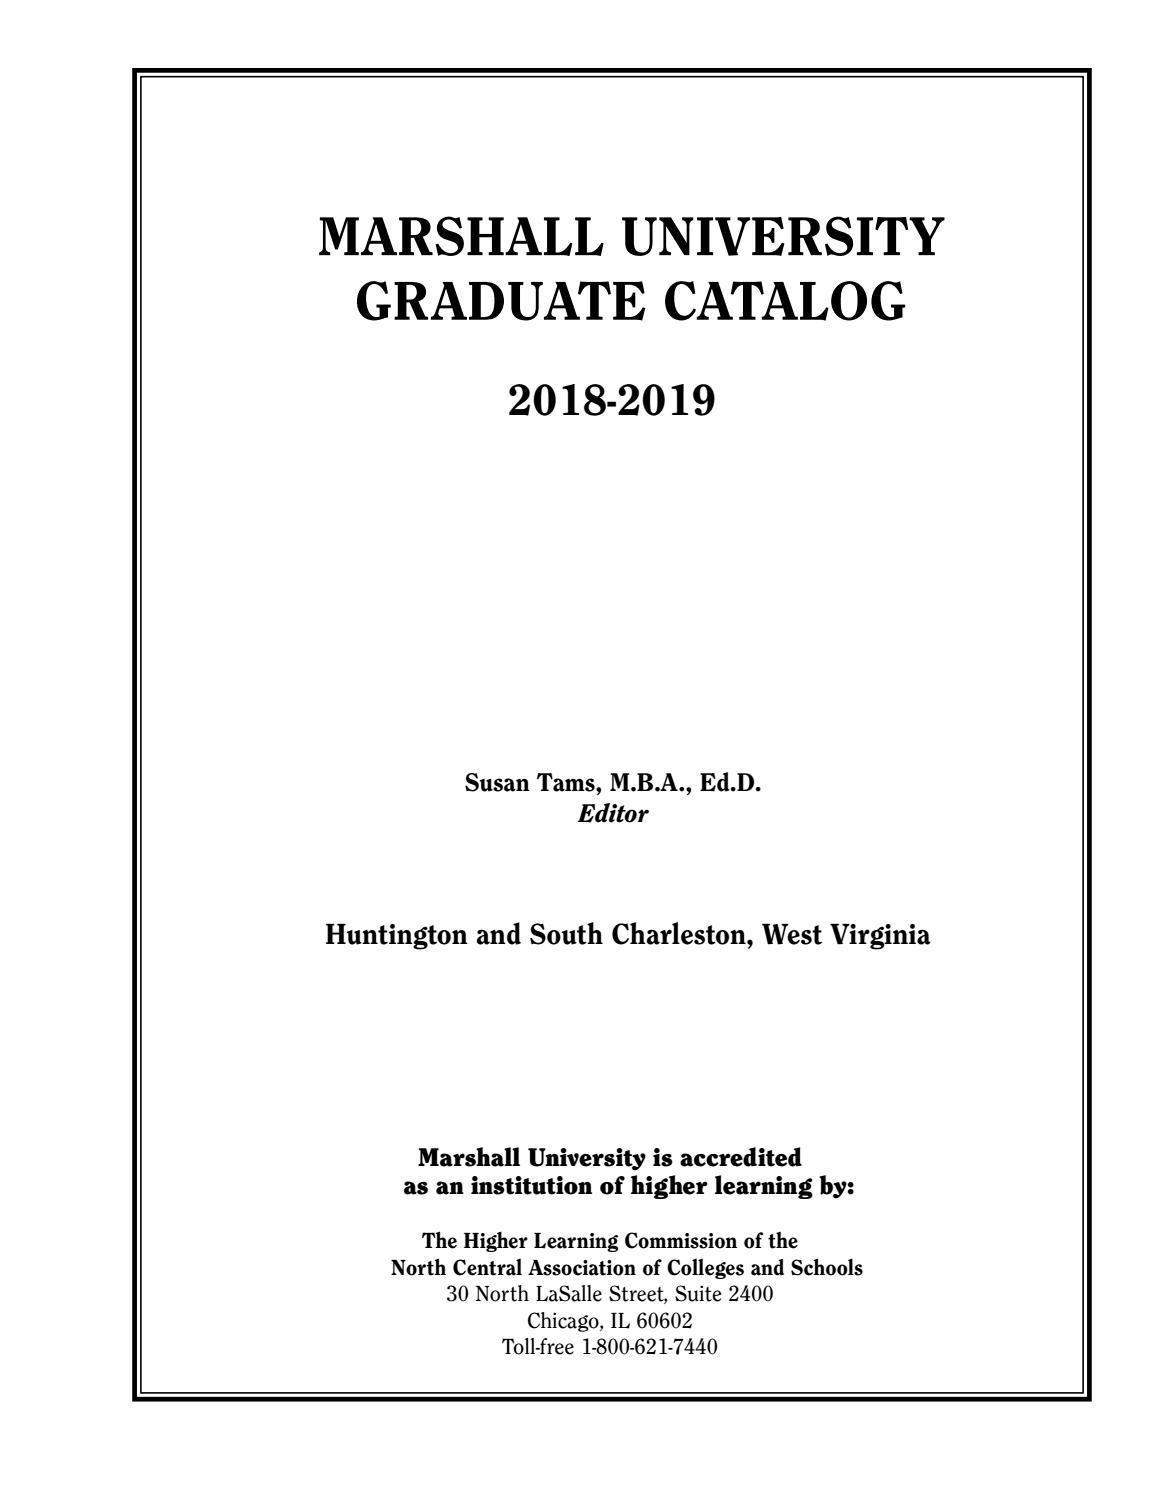 Marshall University Graduate Catalog, 2018-2019 by Susan